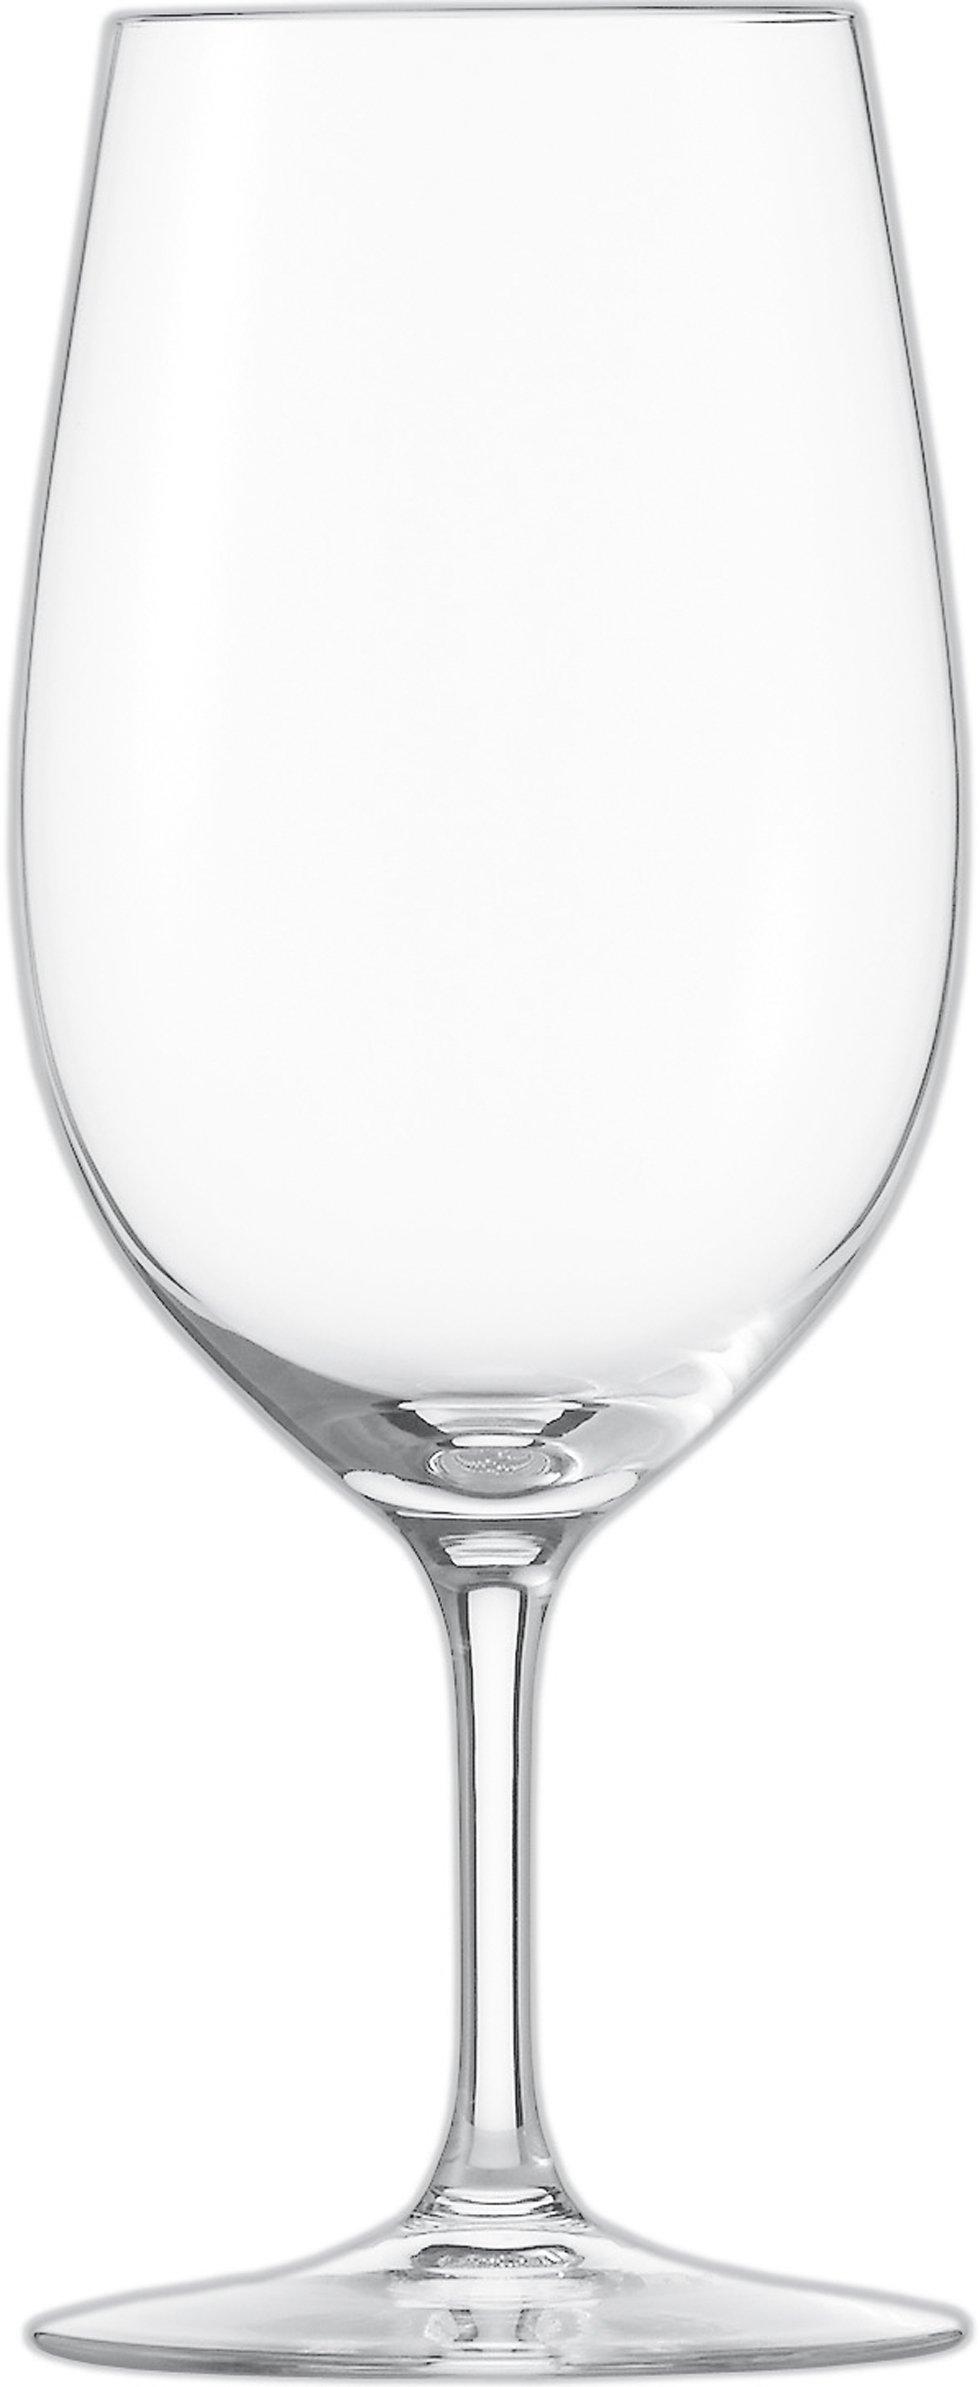 Zwiesel 1872 Enoteca Mineral Water Glass 182, 6pc Set, Water Glass, Drinking Tumbler, Juice Glass, Glass, 359 ml, 113137